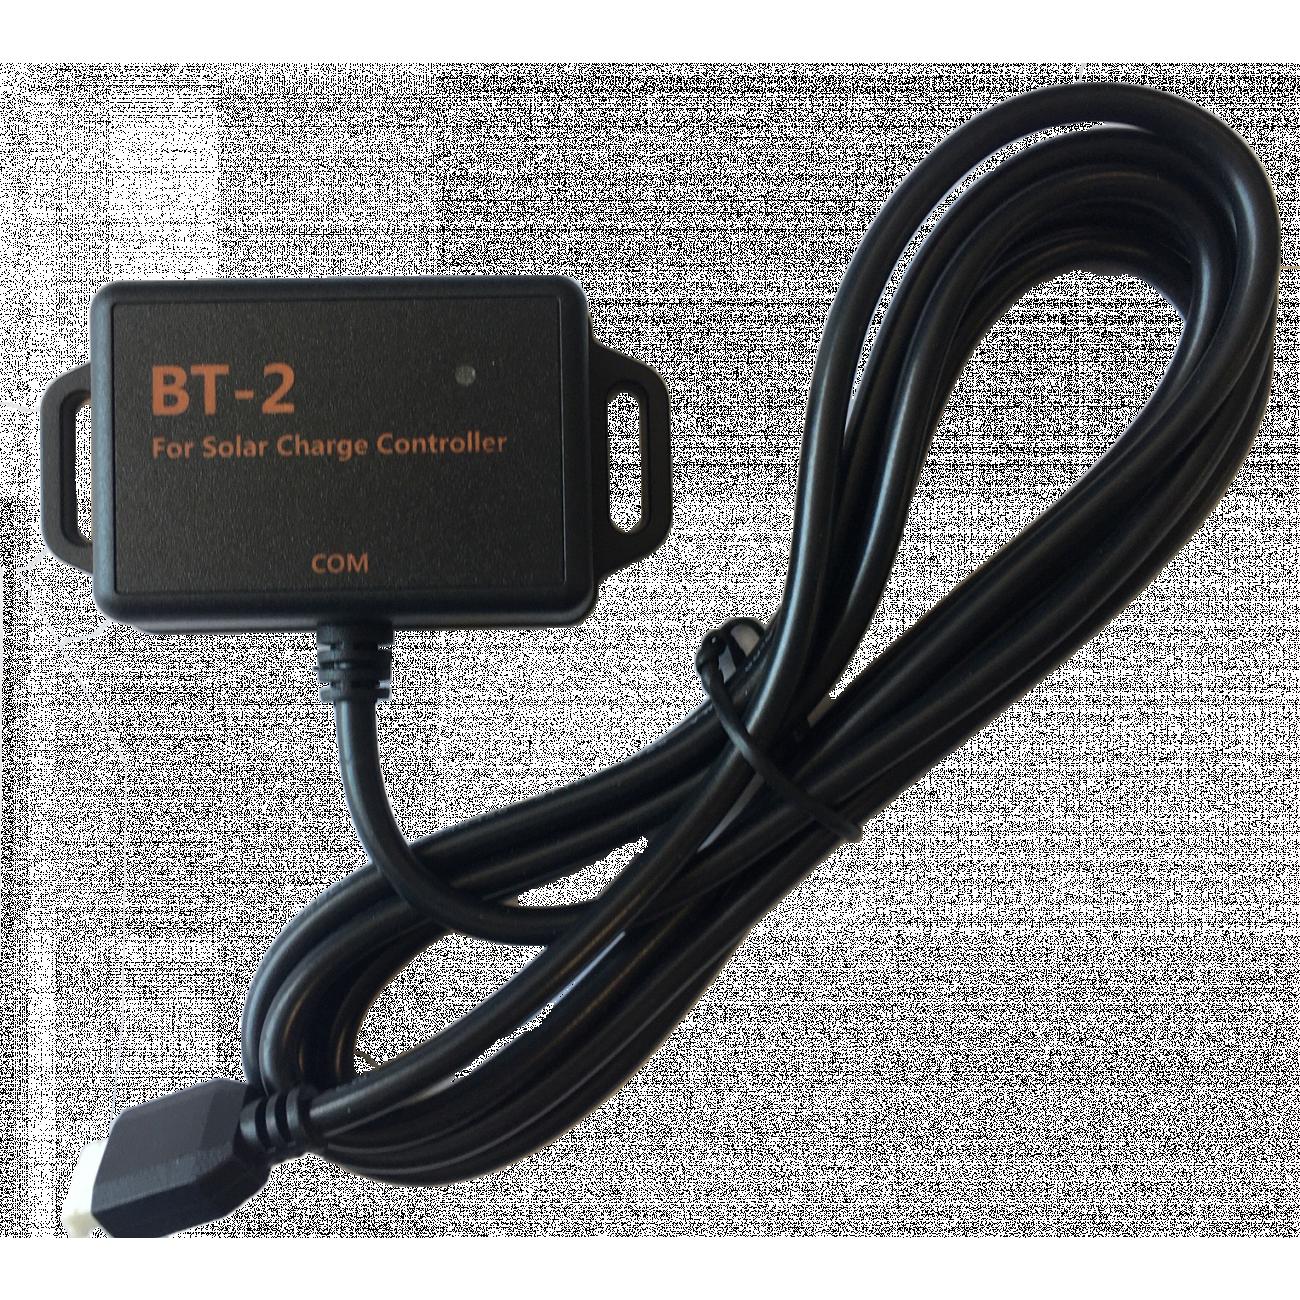 Bluetooth Module For PowerXtreme XS20s